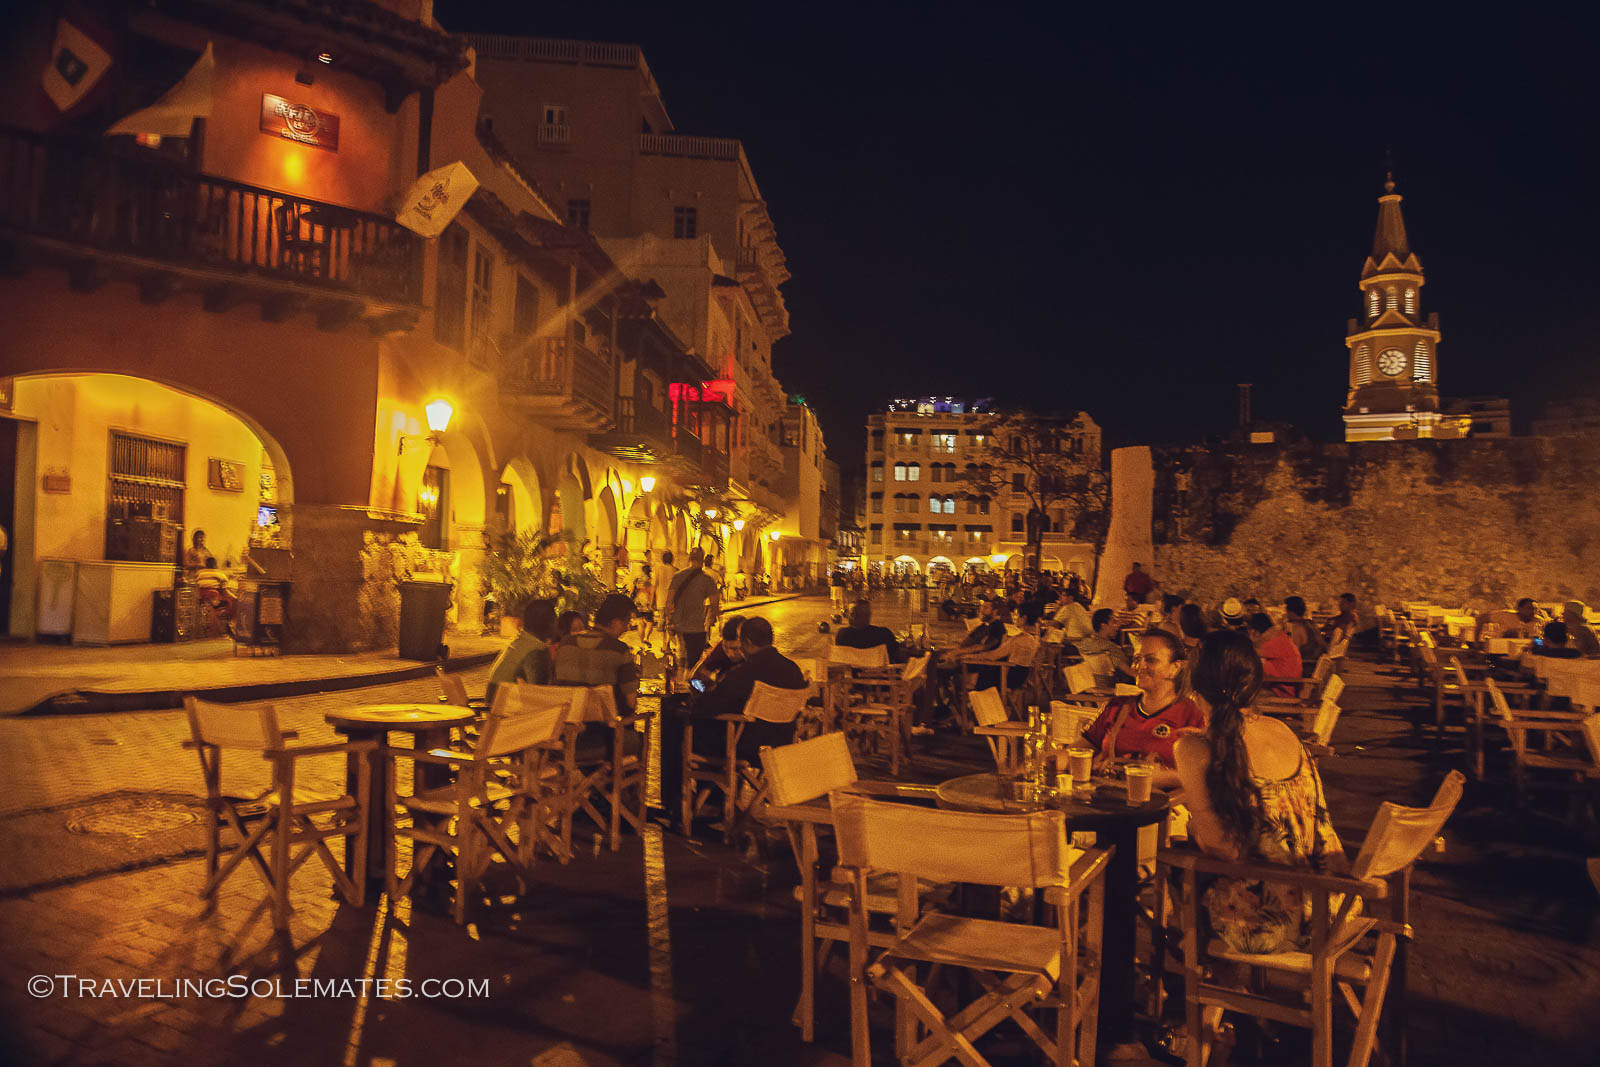 Plaza de Aduana, Old Cartagena, Colombia